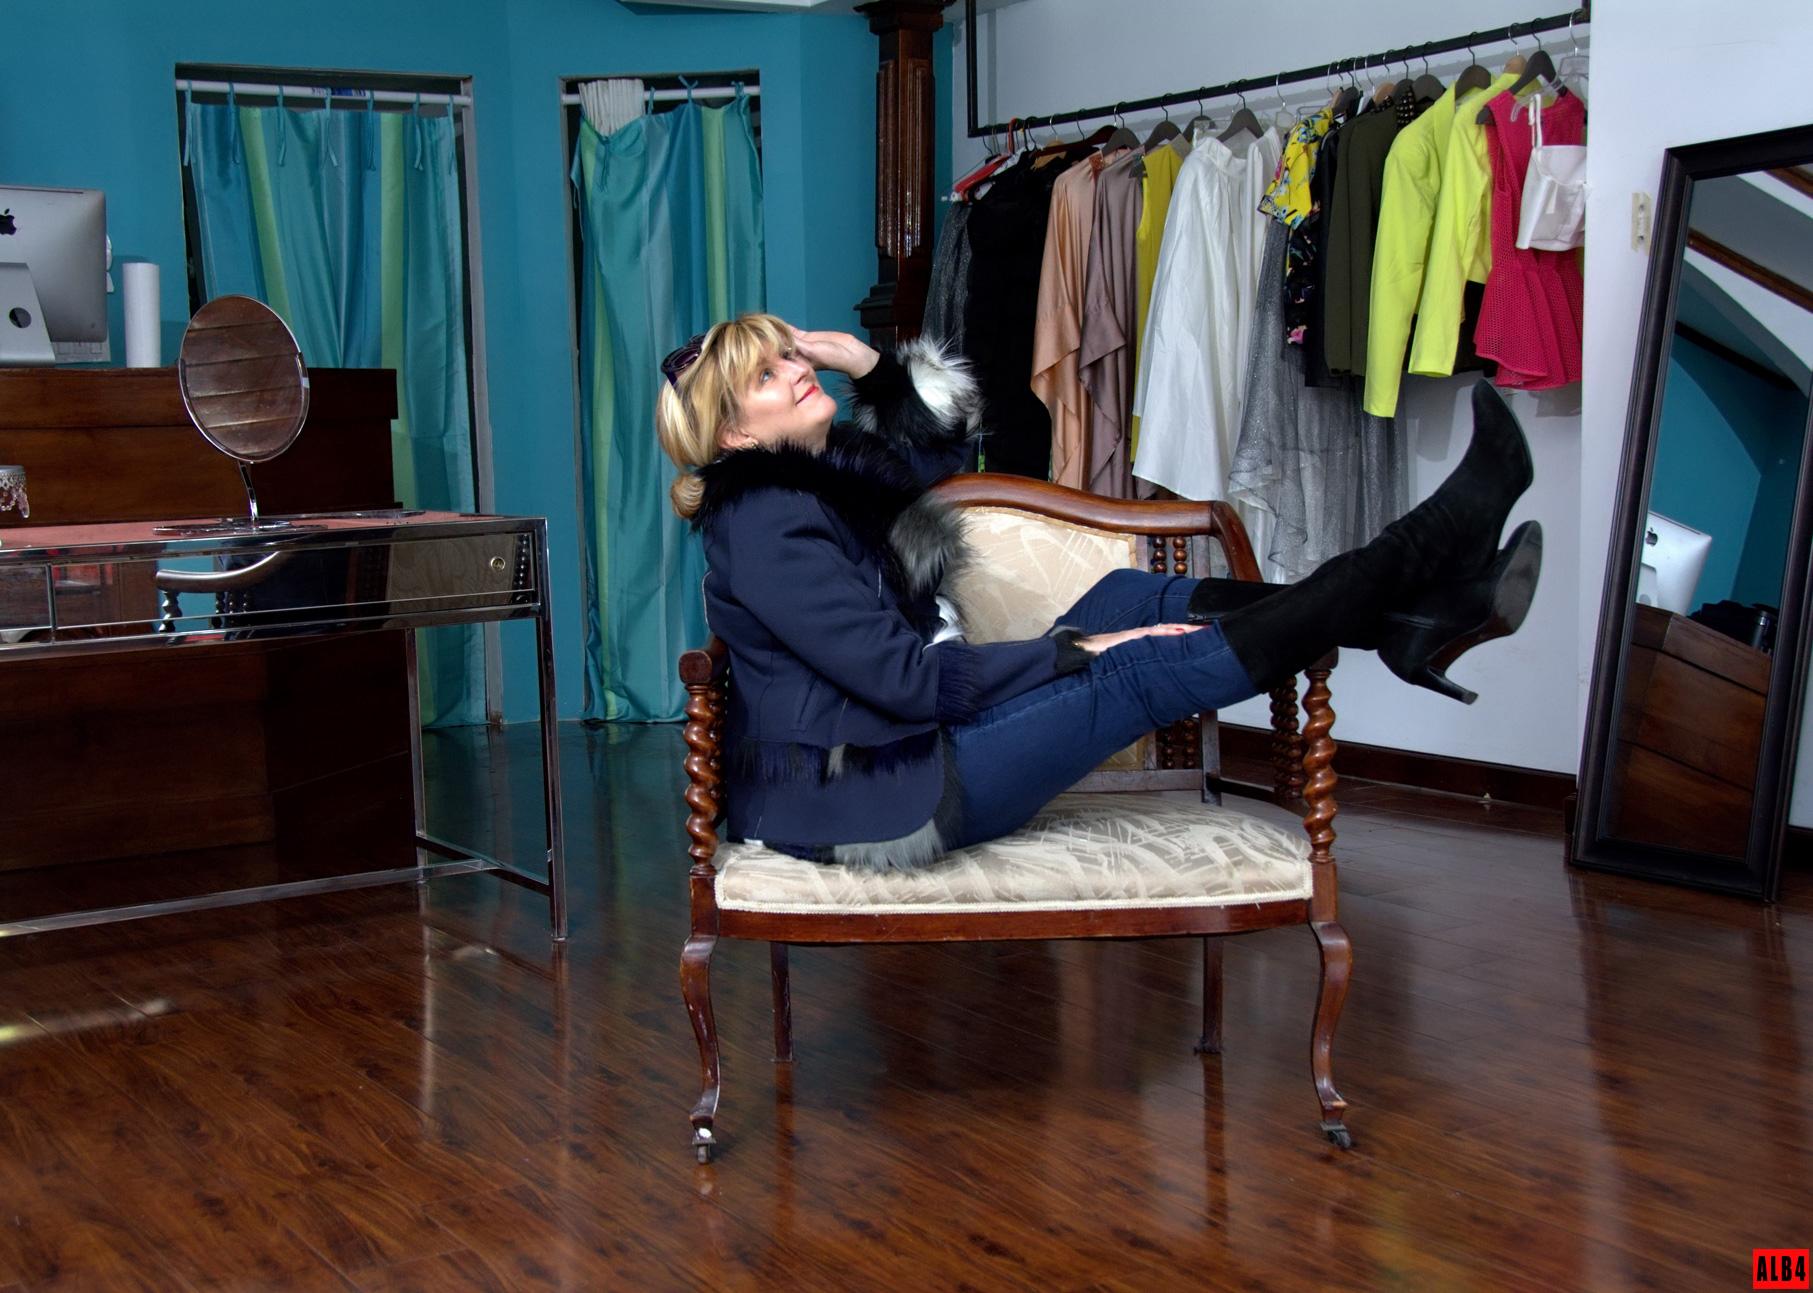 doreen creede wardrobe consultant photo albfor